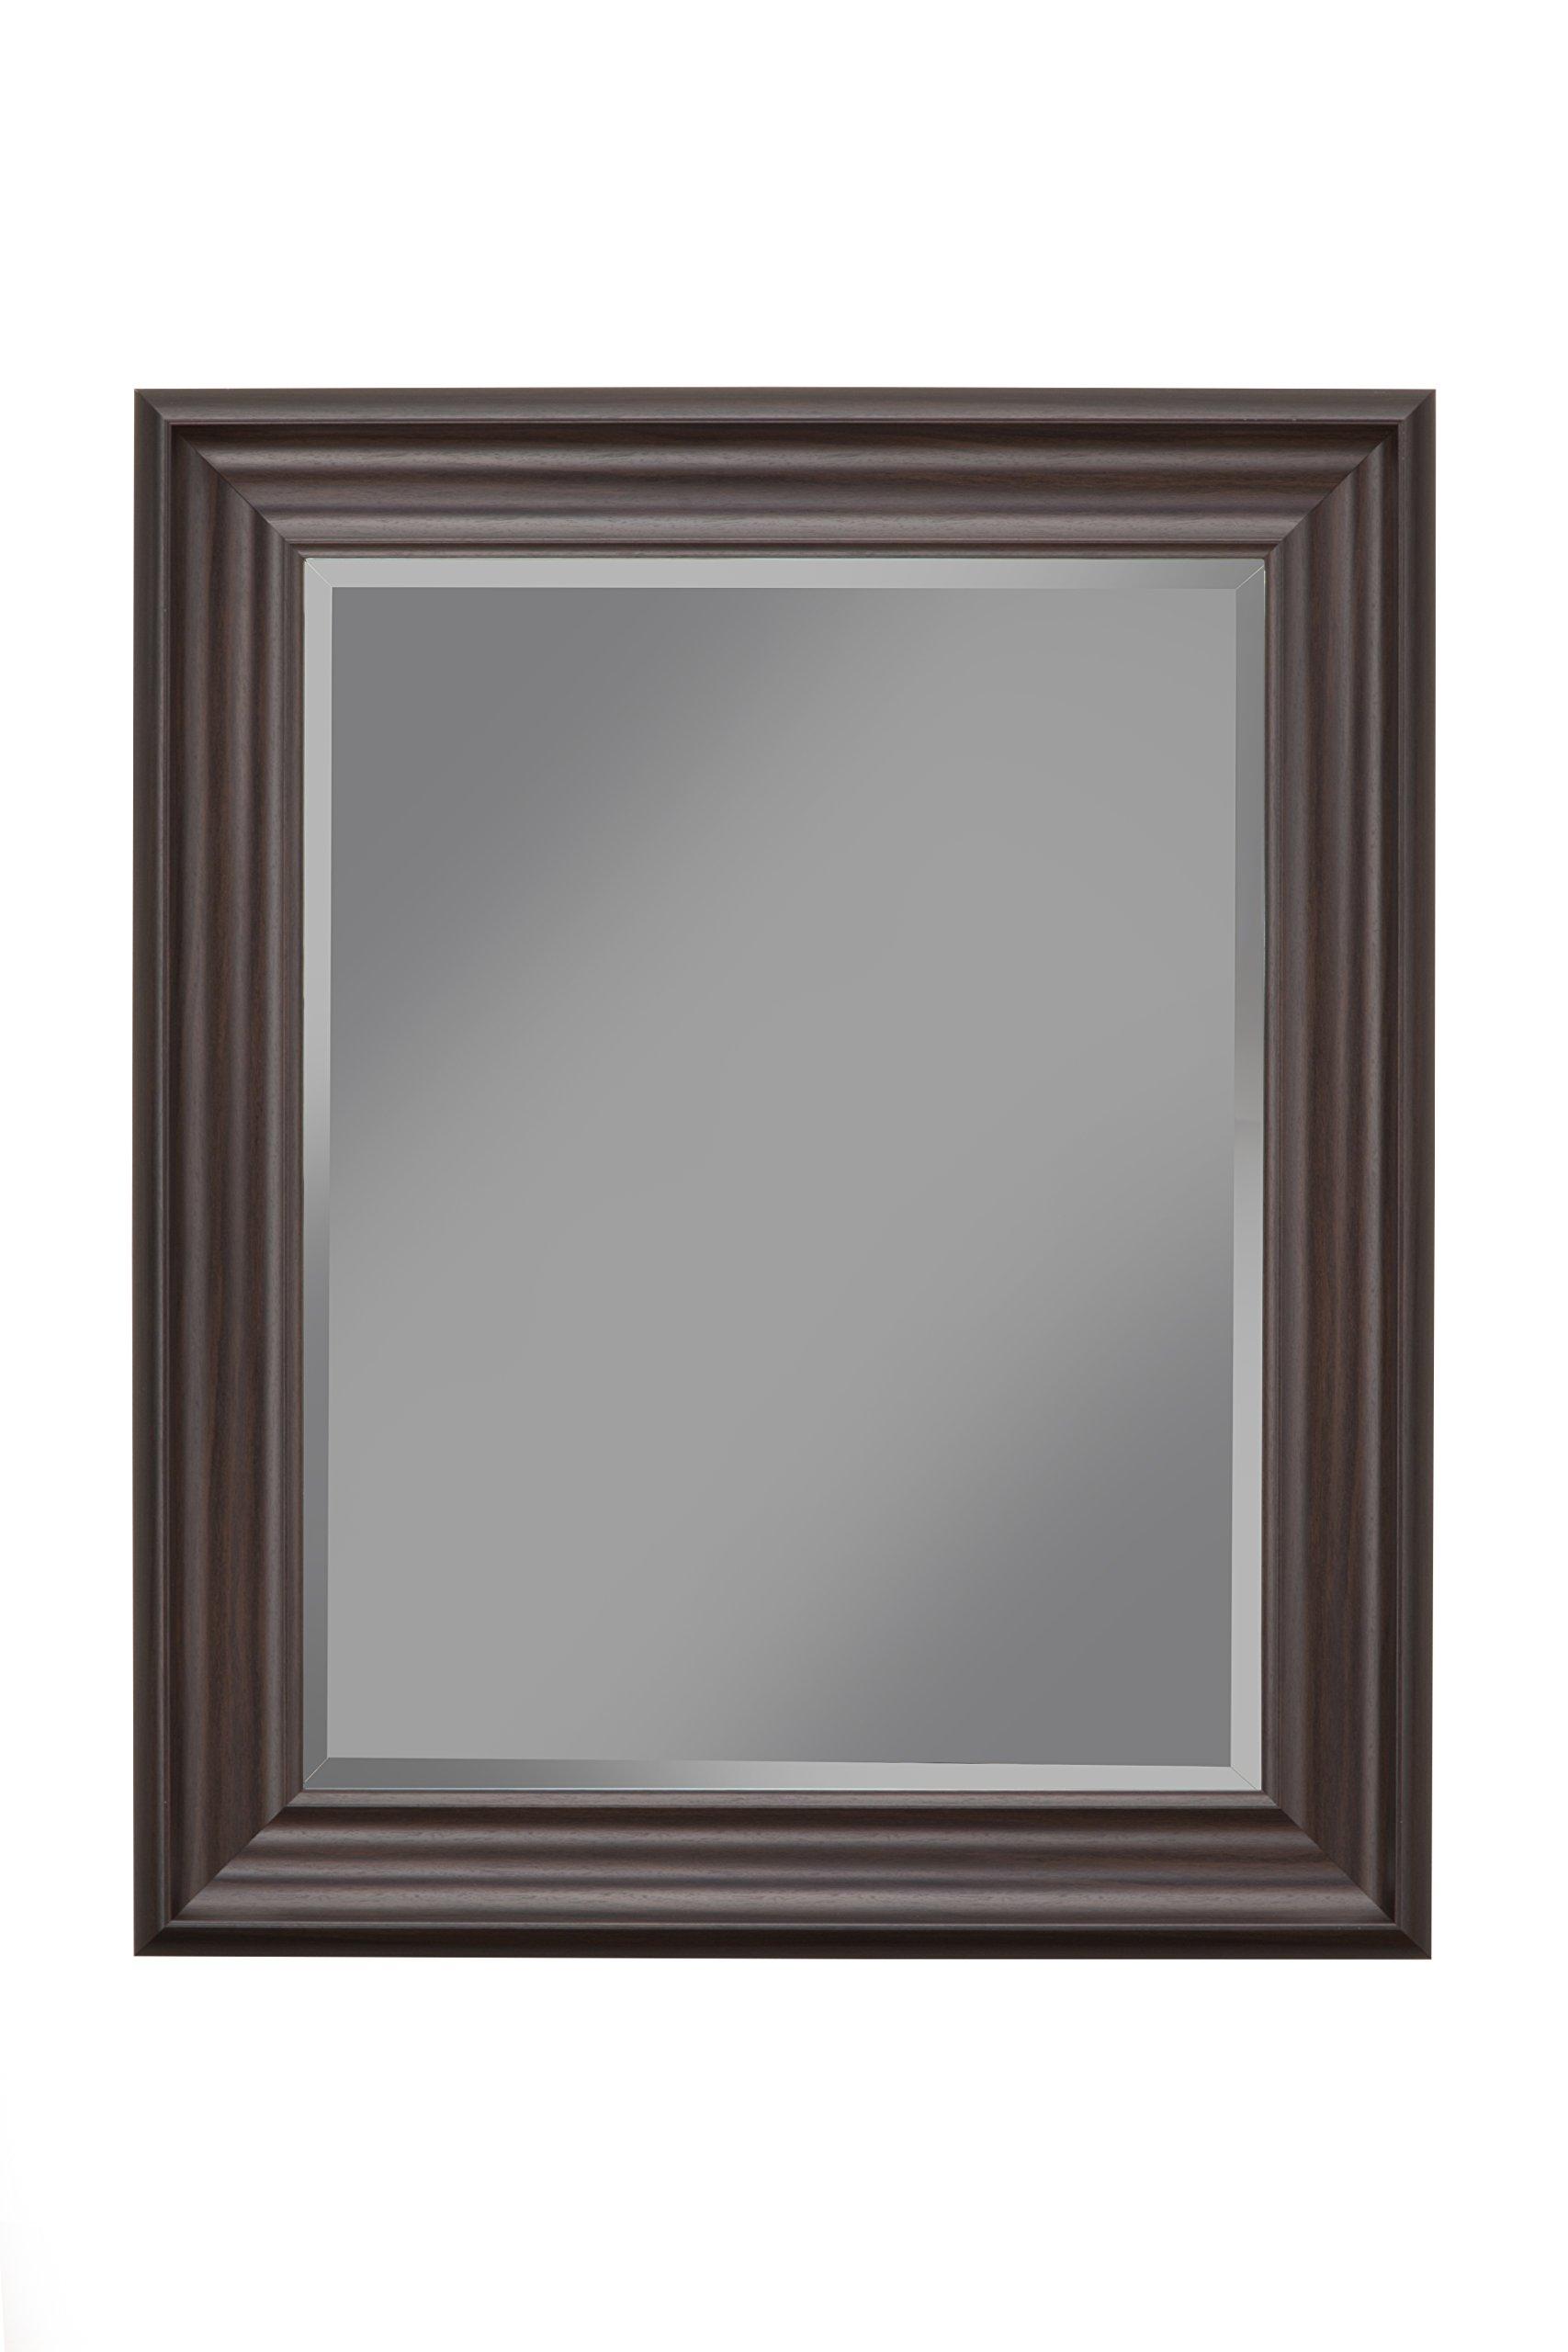 Sandberg Furniture, 36'' x 30'' Wall Mirror, Espresso